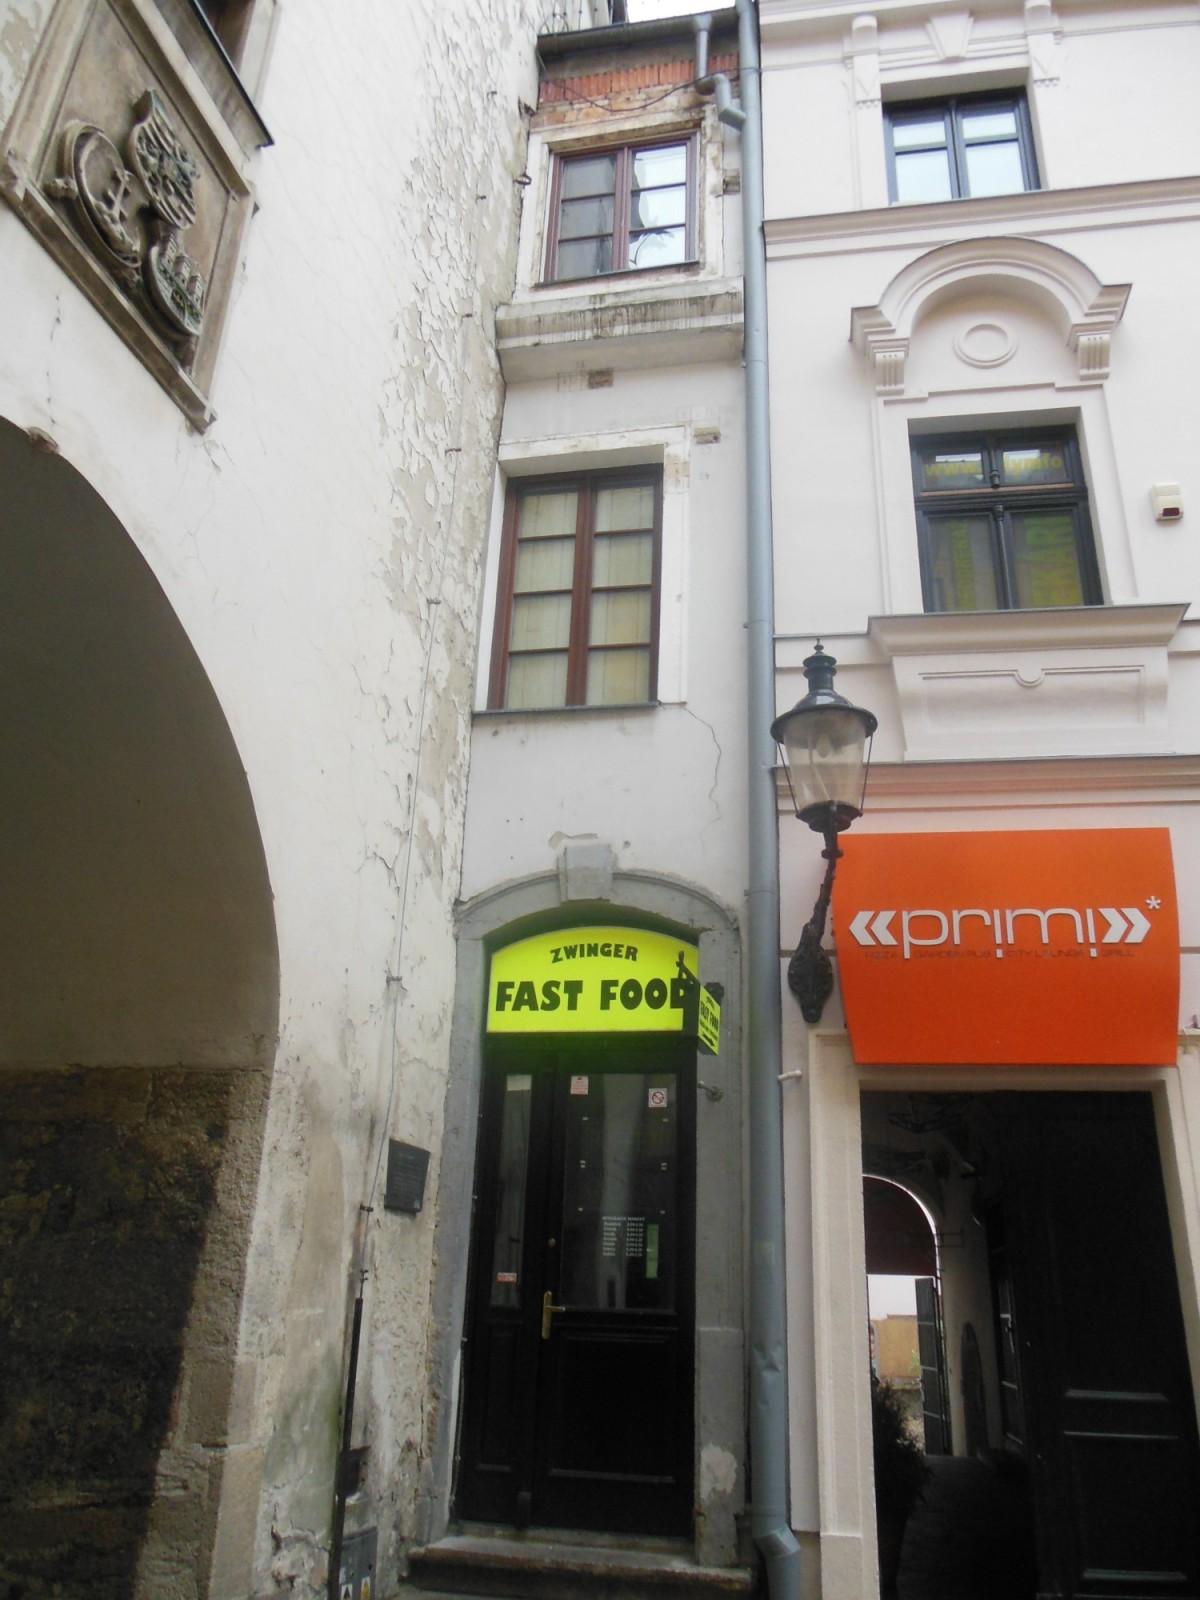 foto: turistika.cz